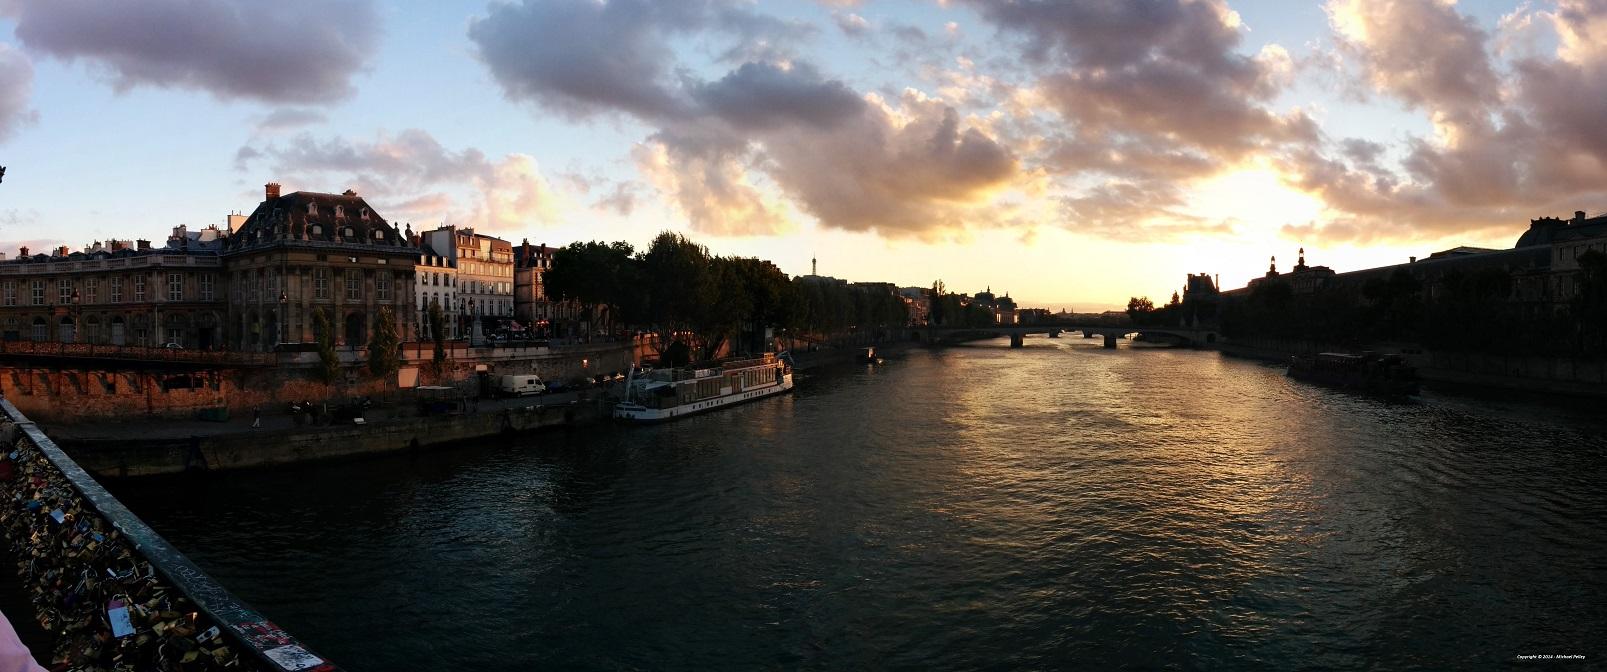 Paris, The Seine and The Lock Bridge 2014 (small)